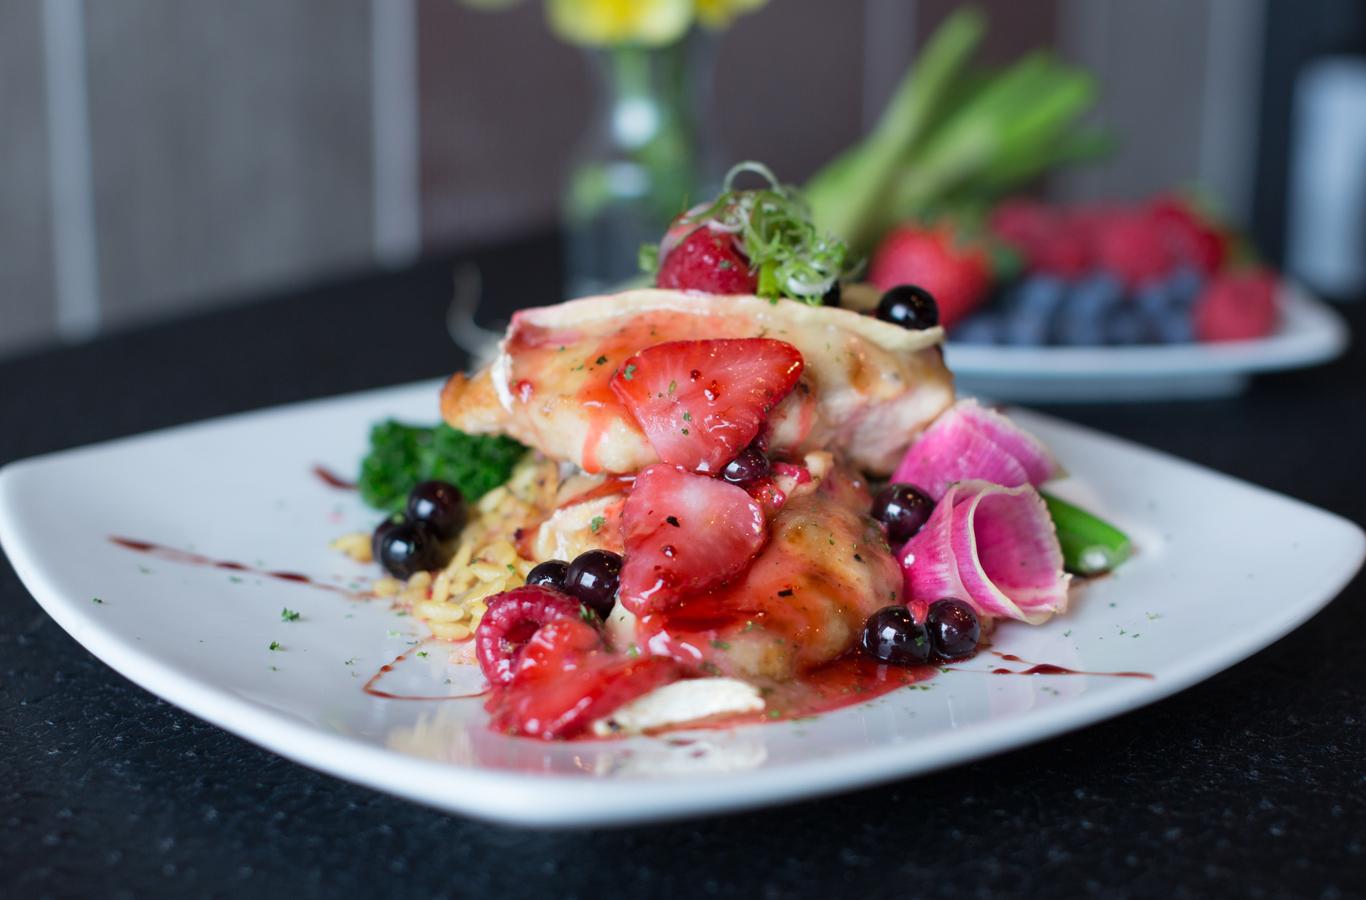 Fruitfood